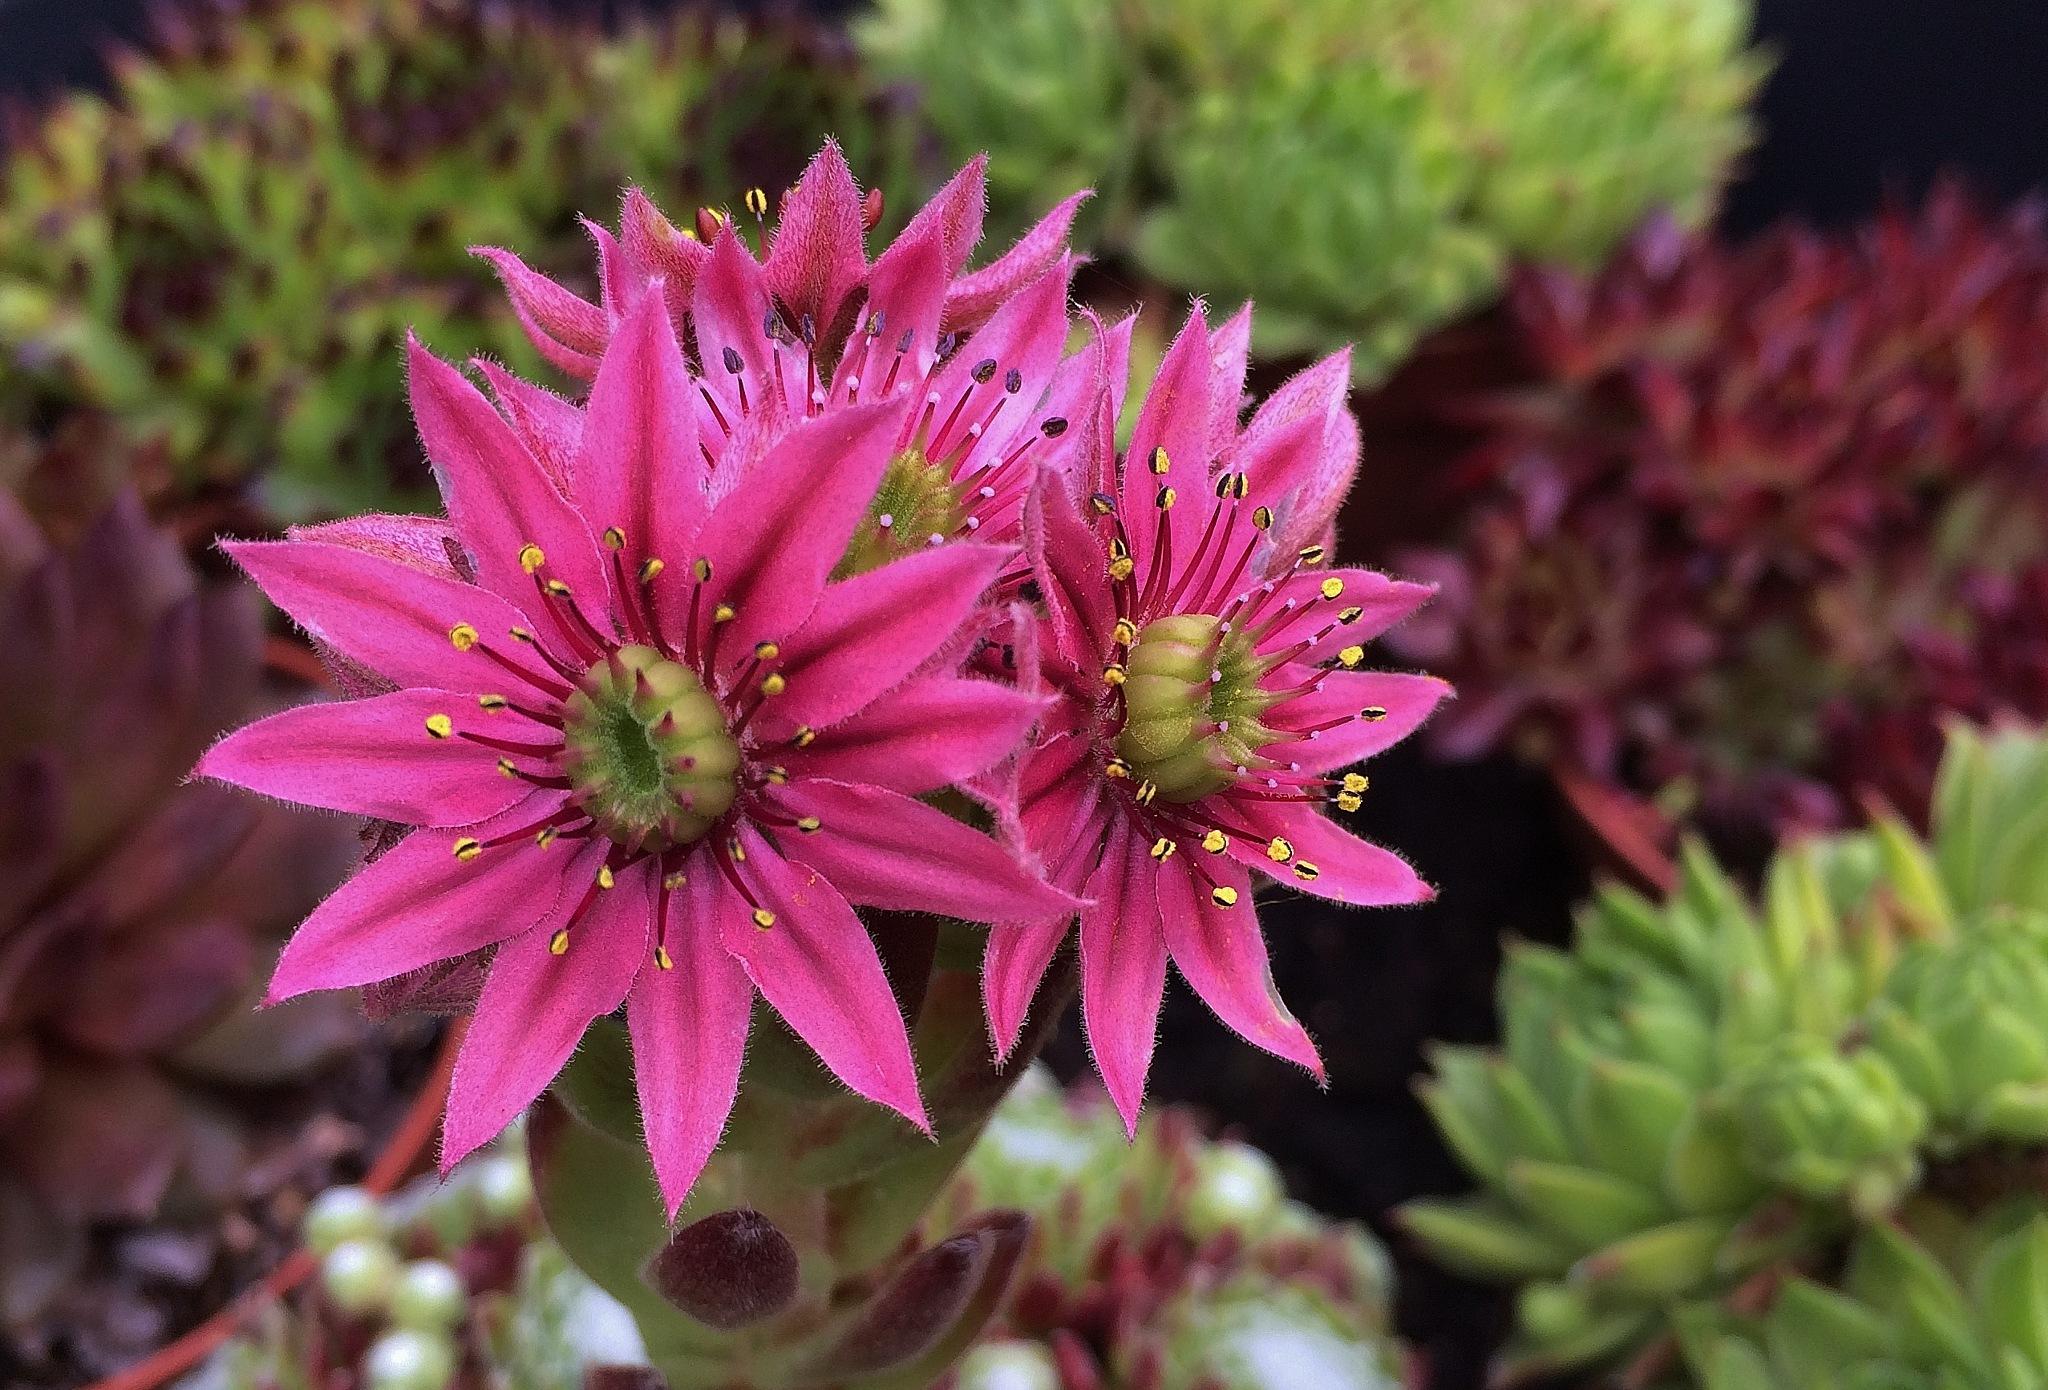 """ Flower in the garden "" by Per Göthe"